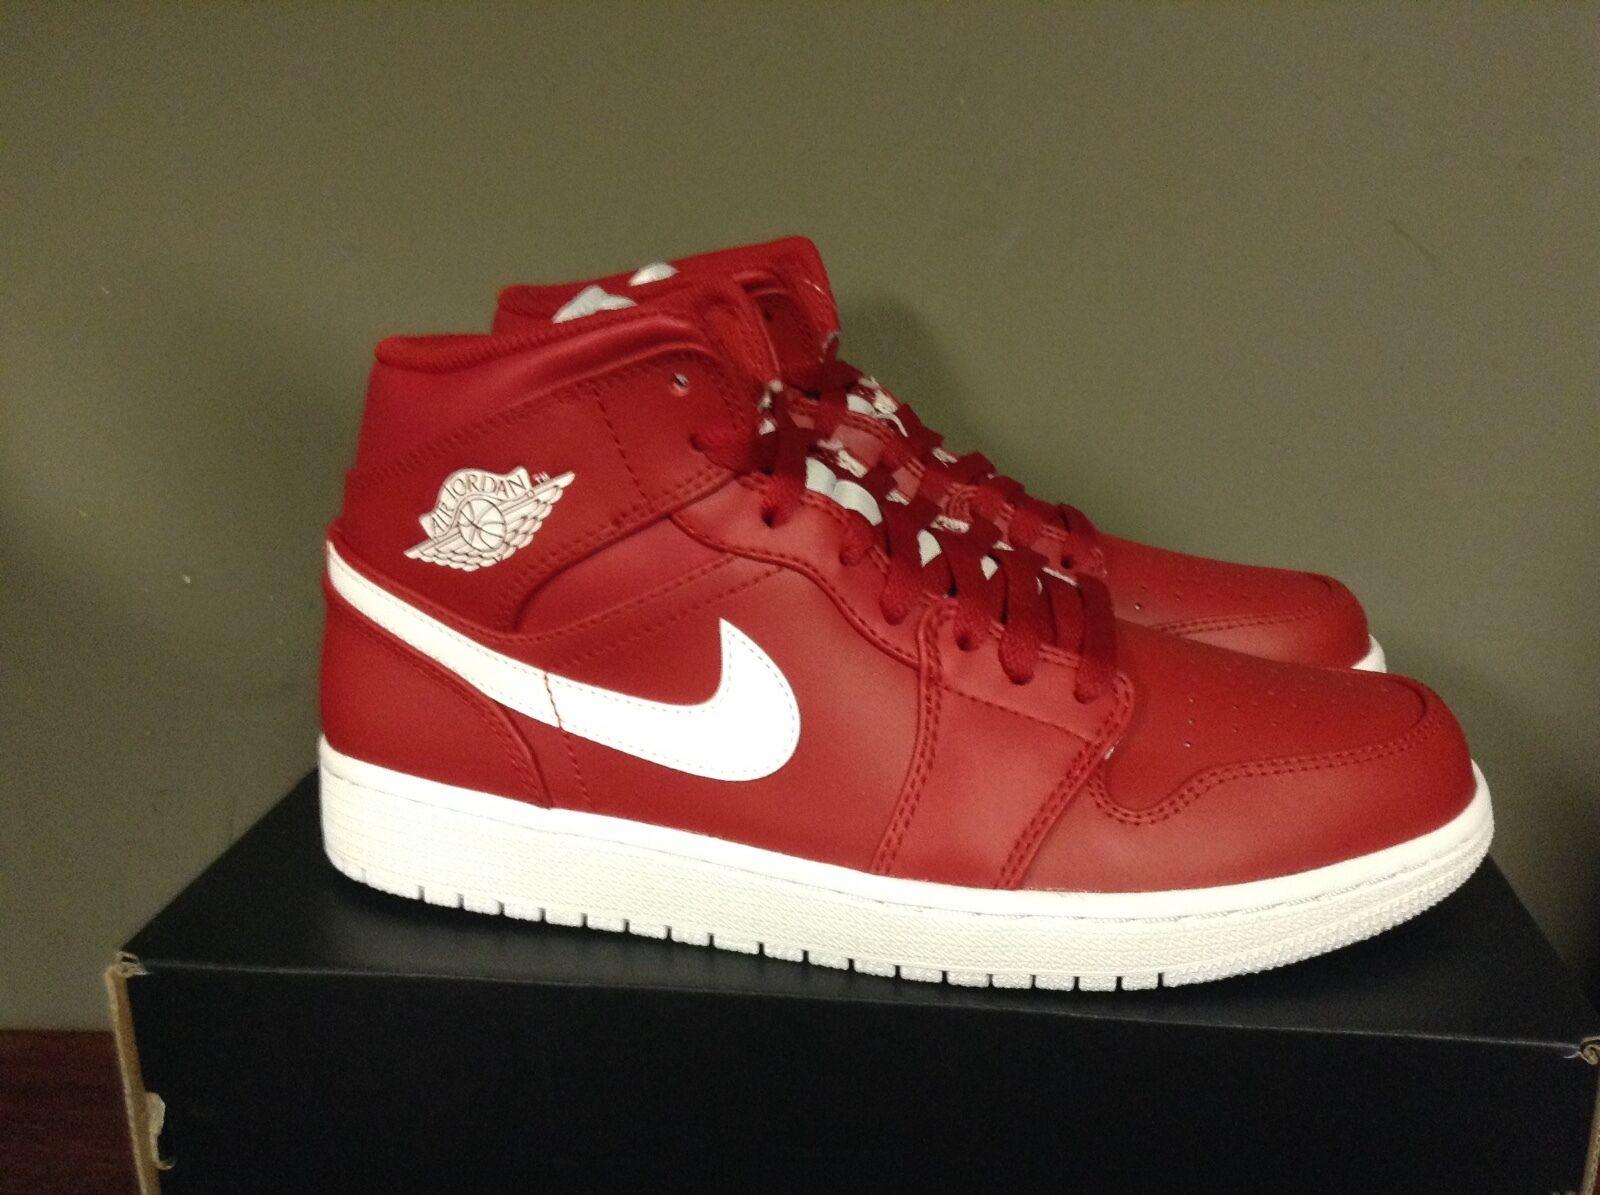 new product 0f5a8 900c7 Nike Men s Air Jordan Retro 1 Mid Lifestyle Shoe GYM RED WHITE-WHITE 554724